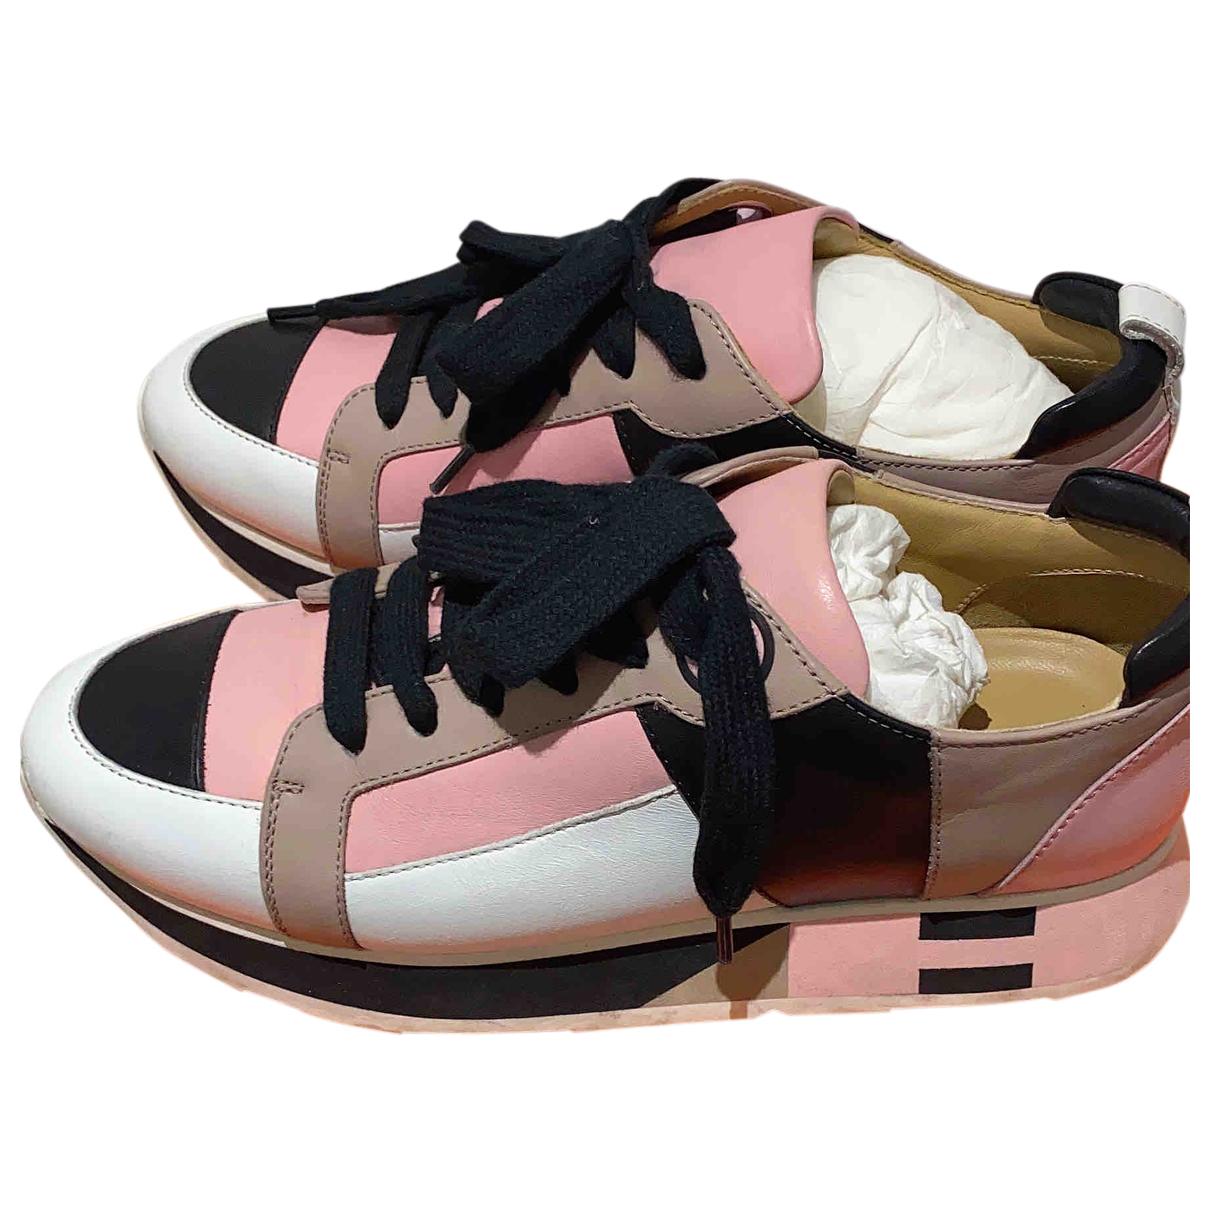 Hermès N Multicolour Leather Trainers for Women 35.5 EU